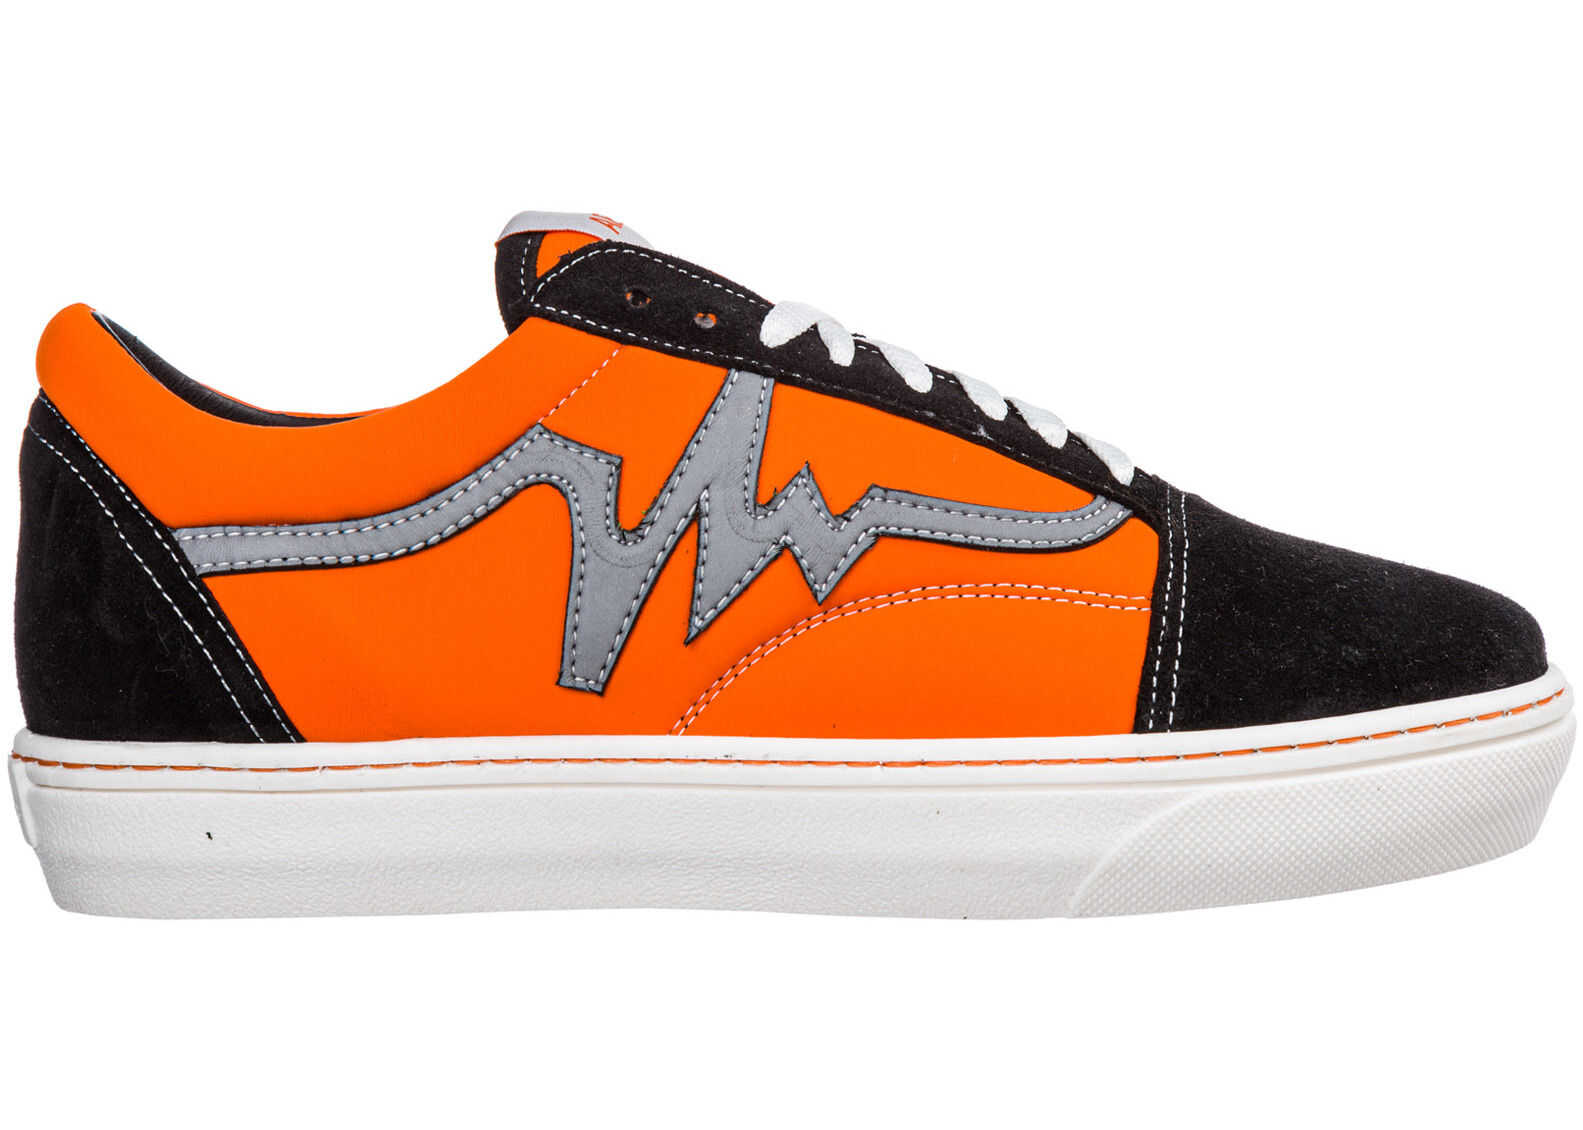 AP08 Sneakers Reflex Orange